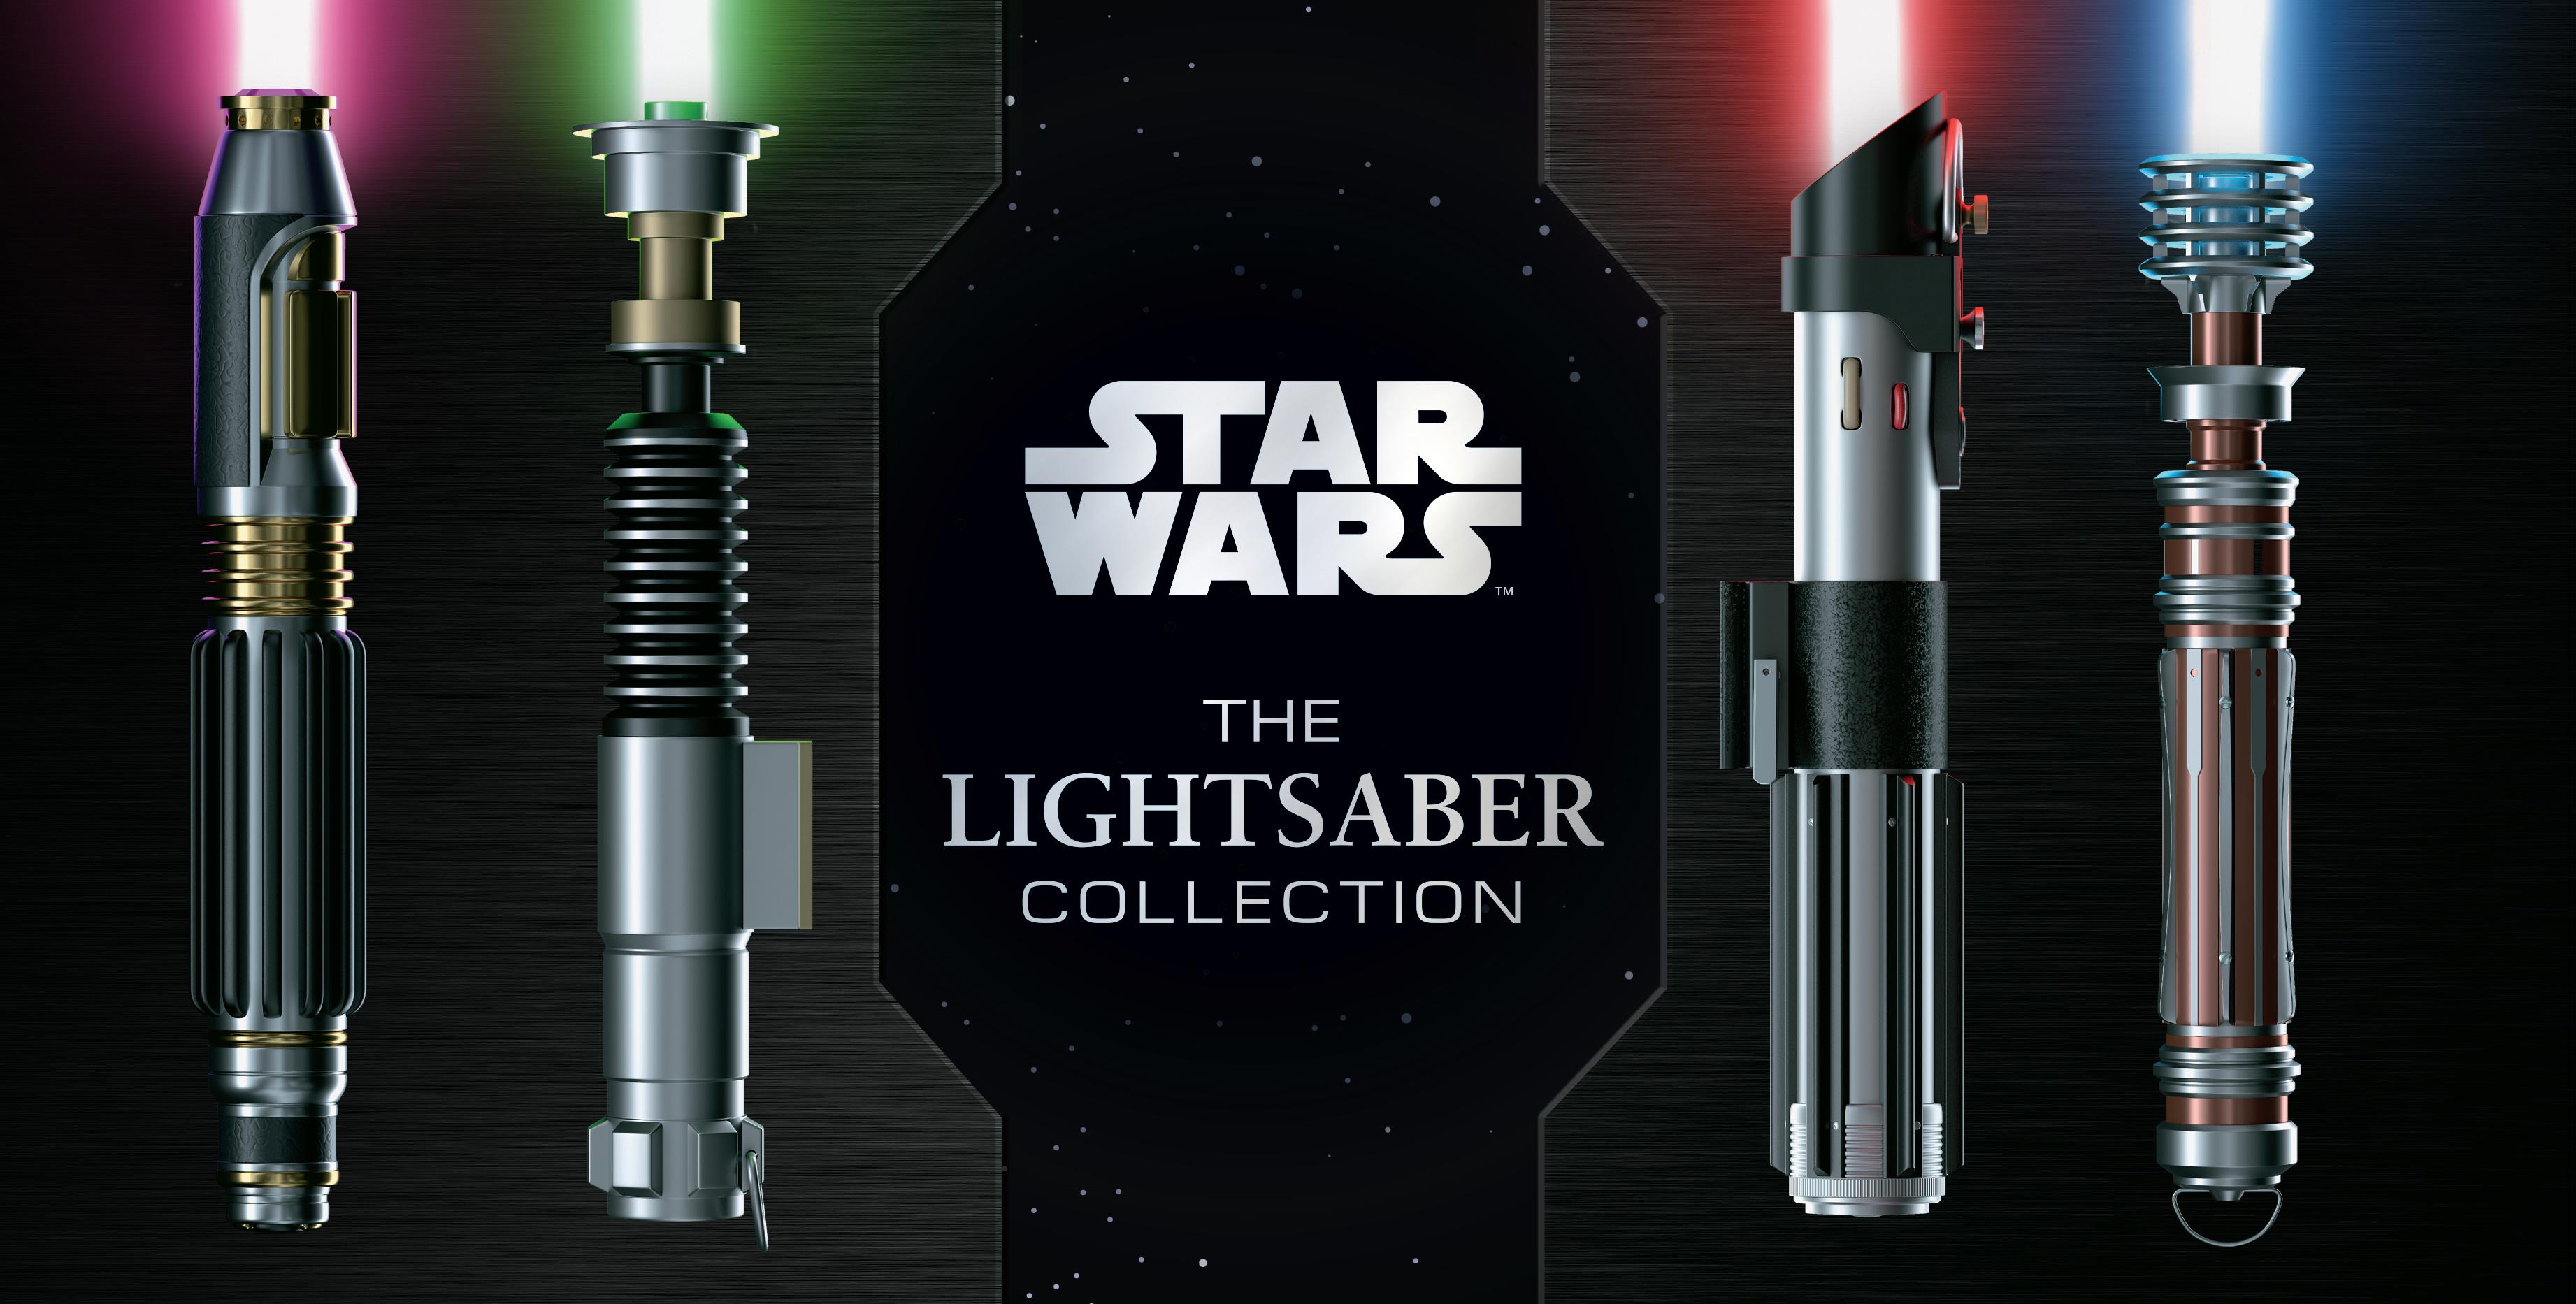 Star Wars The Lightsaber Collection Wookieepedia Fandom Gungi was een wookiee youngling ten tijde van de clone wars. star wars the lightsaber collection